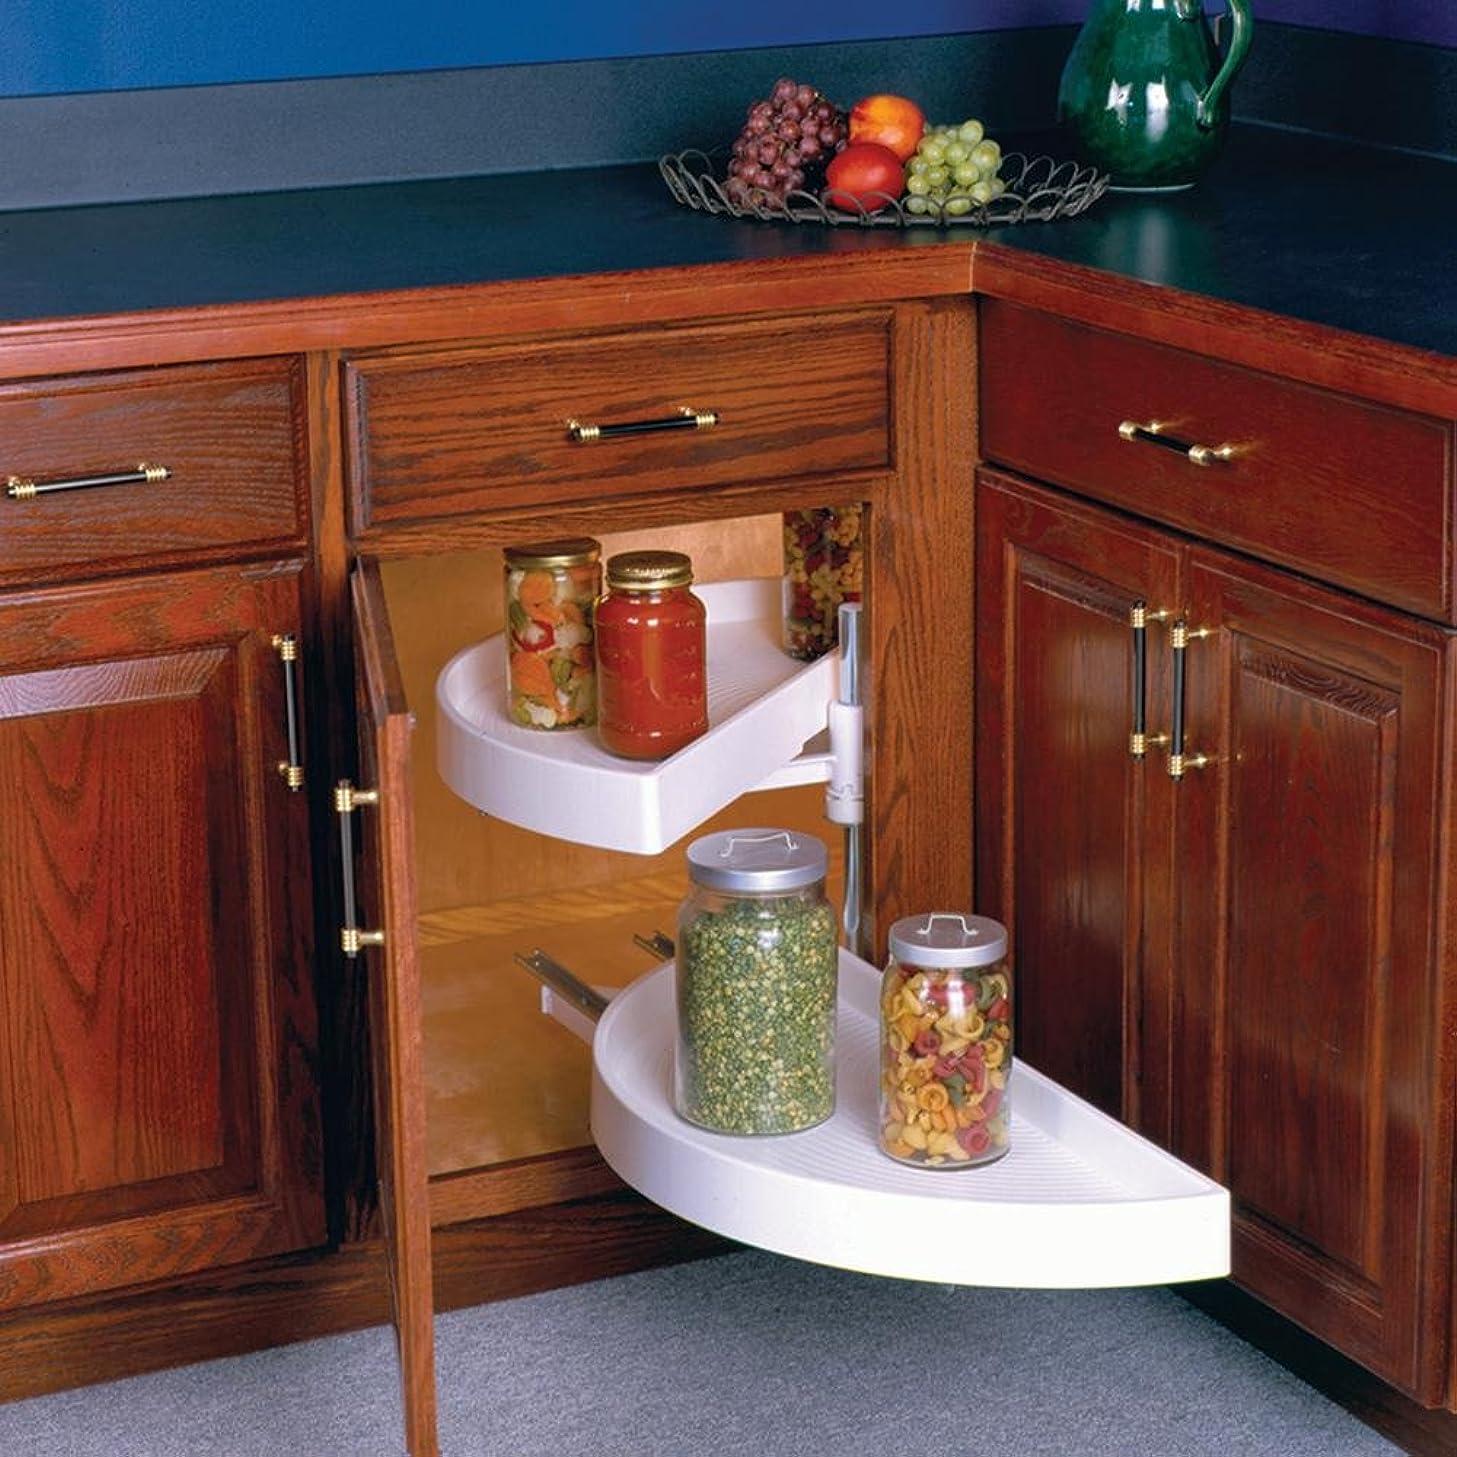 Half Moon Lazy Susans-Bottom Shelf Pull-Out Plastic Two Shelf Sets, Including Hardware